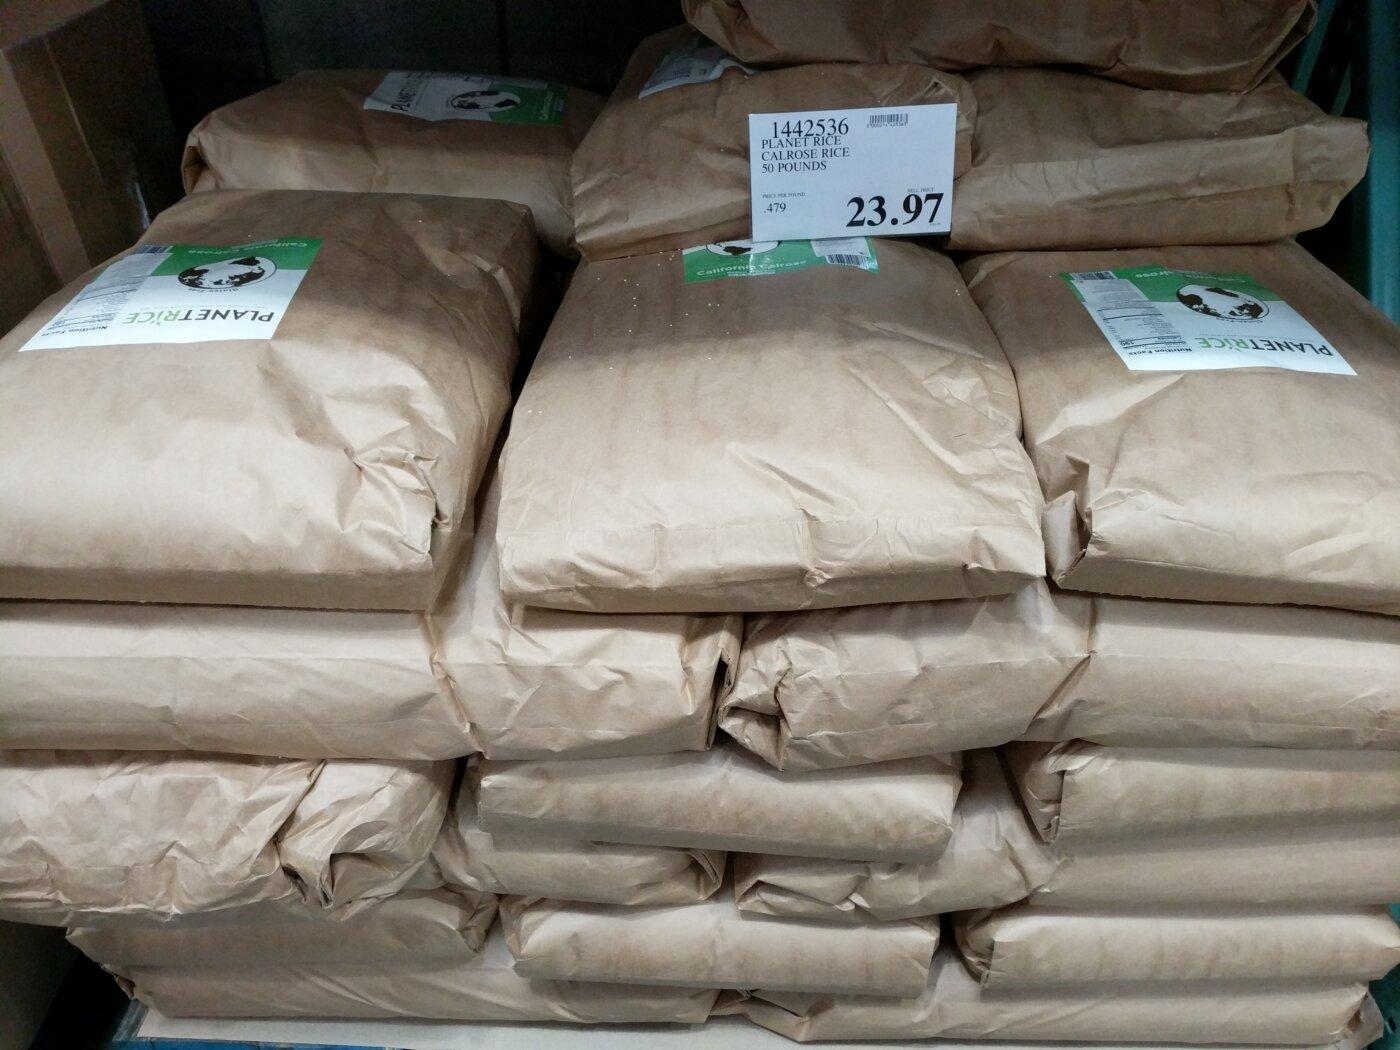 Planet Rice CalRose Rice - 1442536